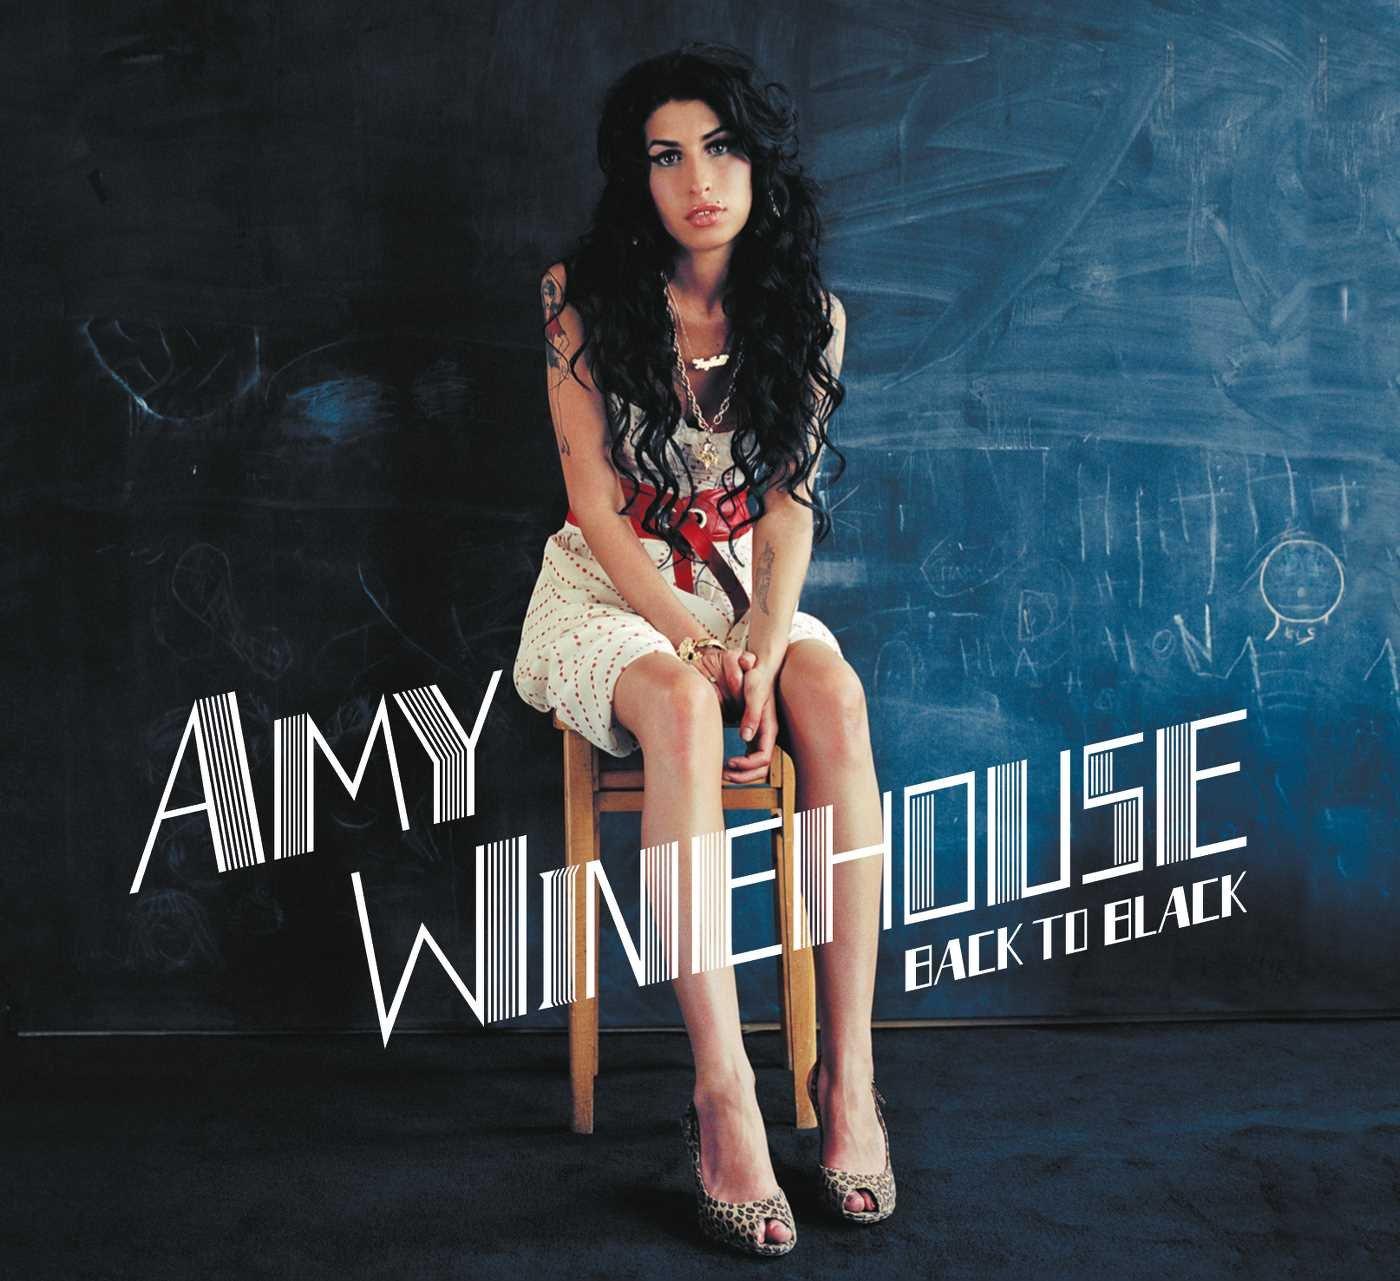 Amy Winehouse - Back to Black (LP-VINILO)